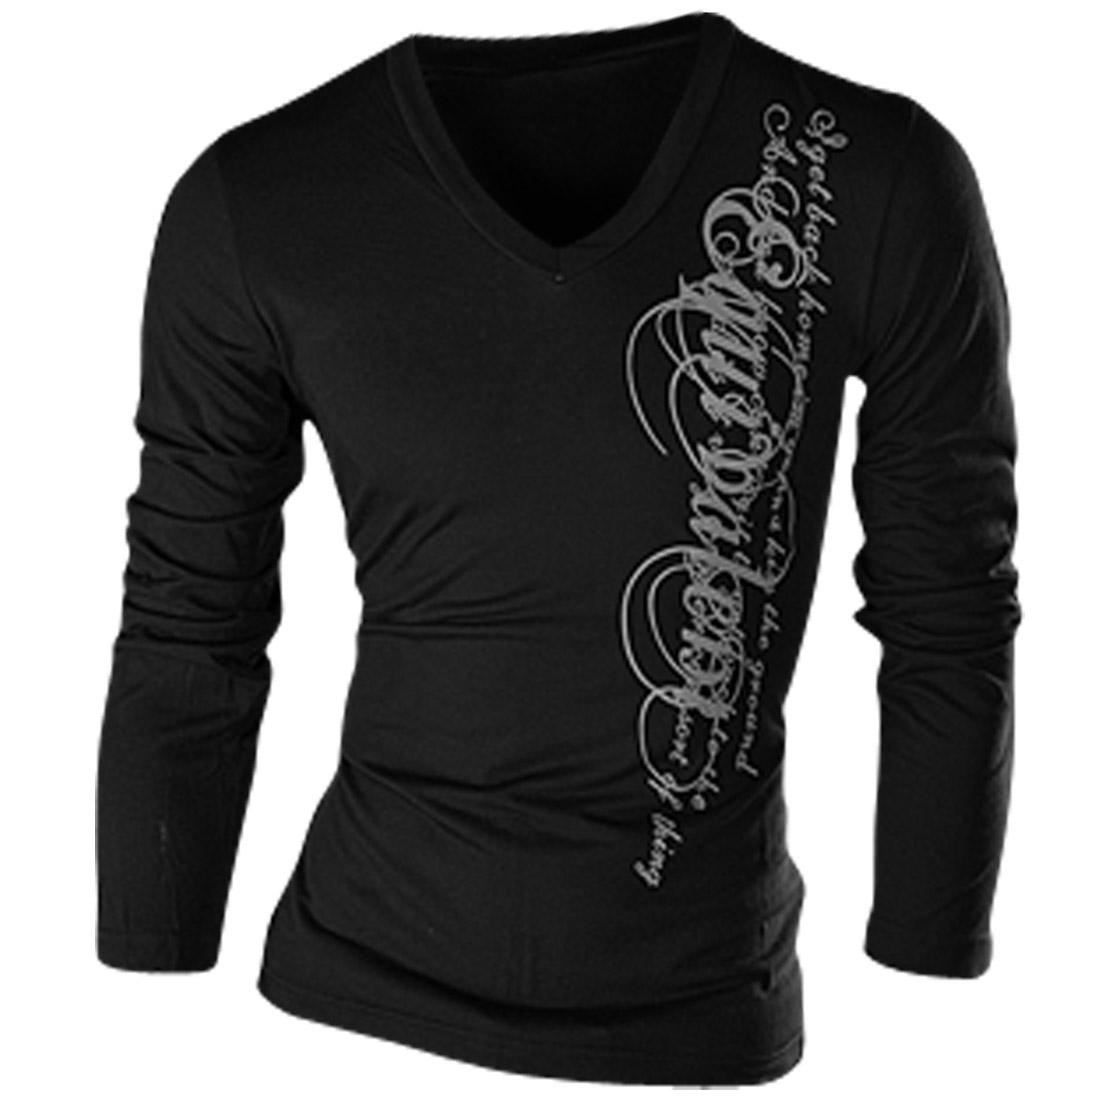 Man V Neck Long-sleeved Letter Pattern Pullover Black Tee Shirt M